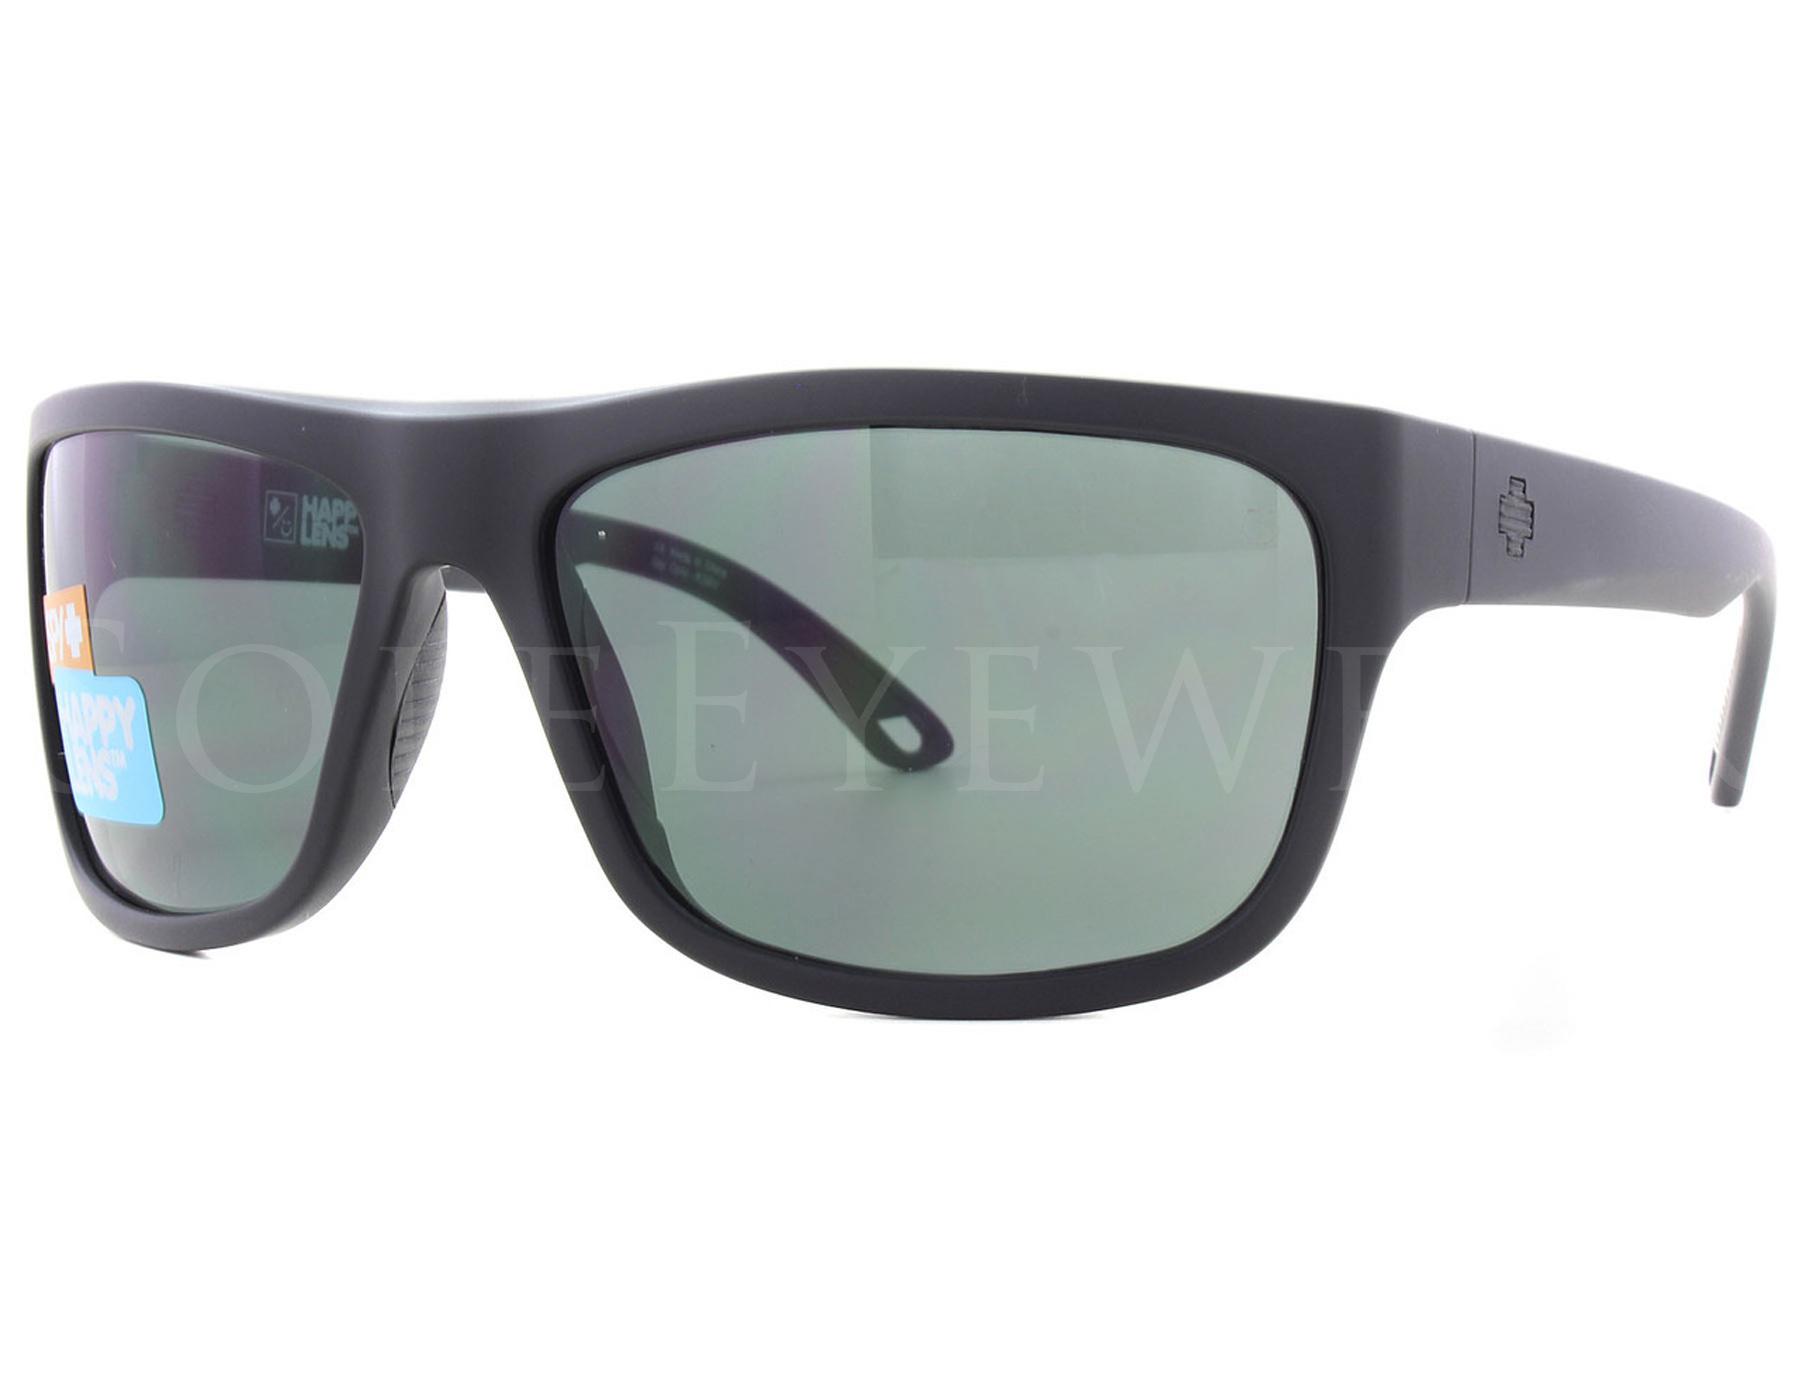 92752b4fdf Details about NEW SPY OPTICS Angler Matte Black Happy Grey 673237374863  Sunglasses